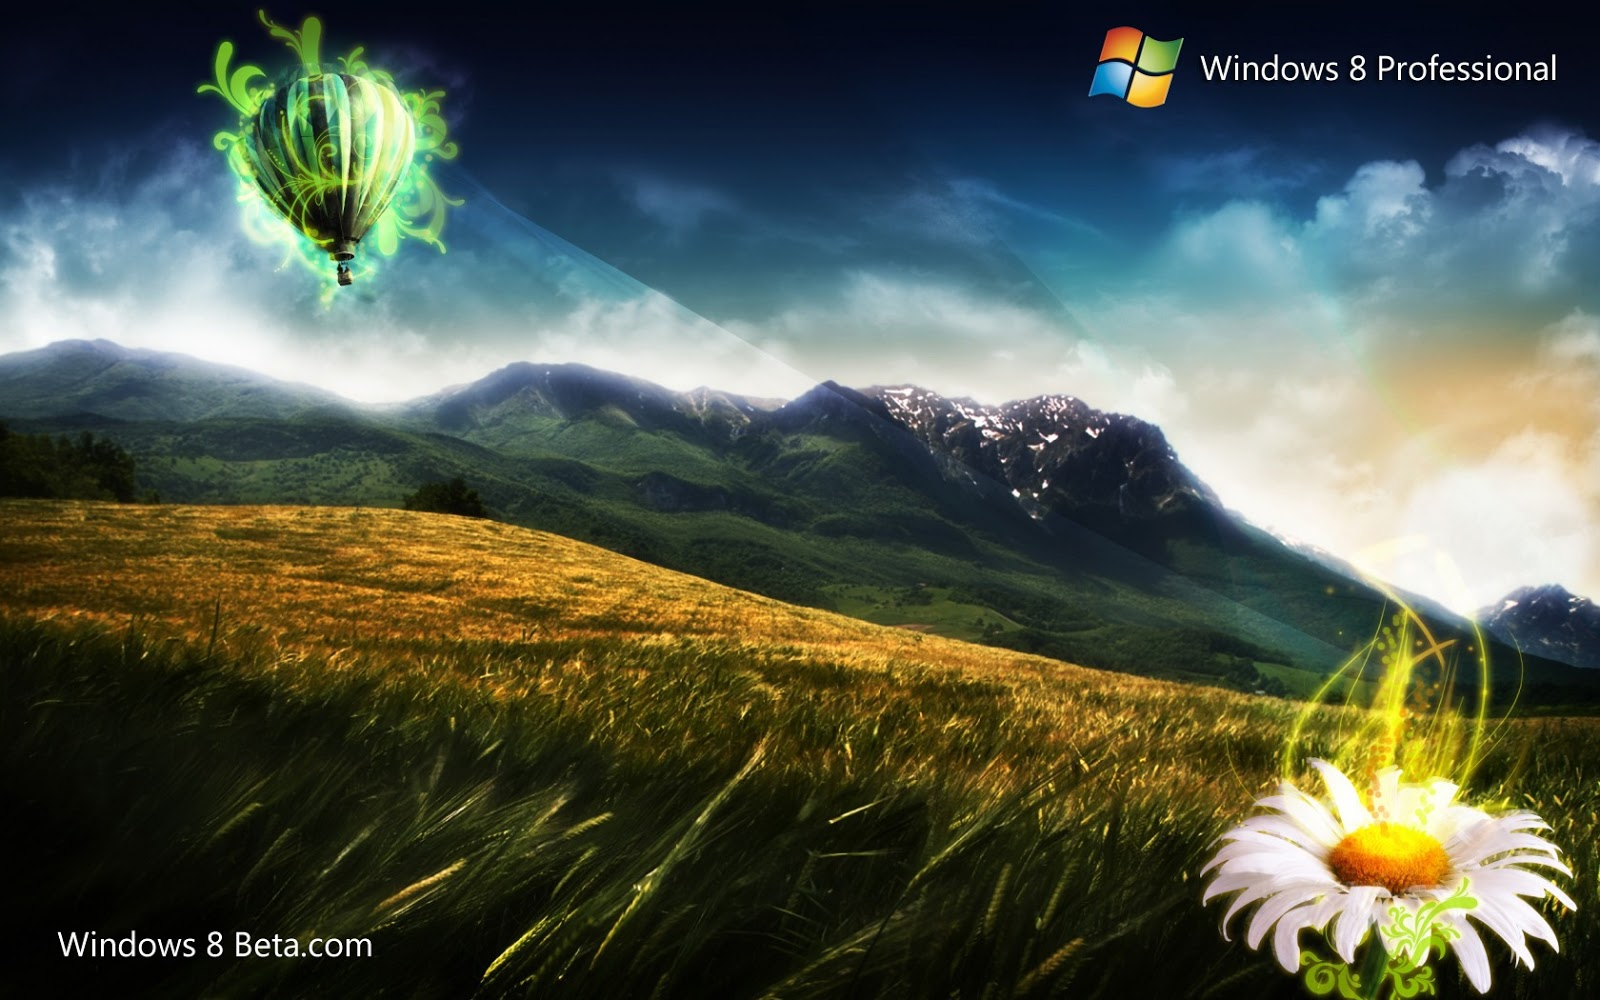 http://4.bp.blogspot.com/-xOQ8oMfERd0/UJaDK87QAII/AAAAAAAAG4M/yZlGrlonTSw/s1600/Windows-8-wallpaper21.jpg